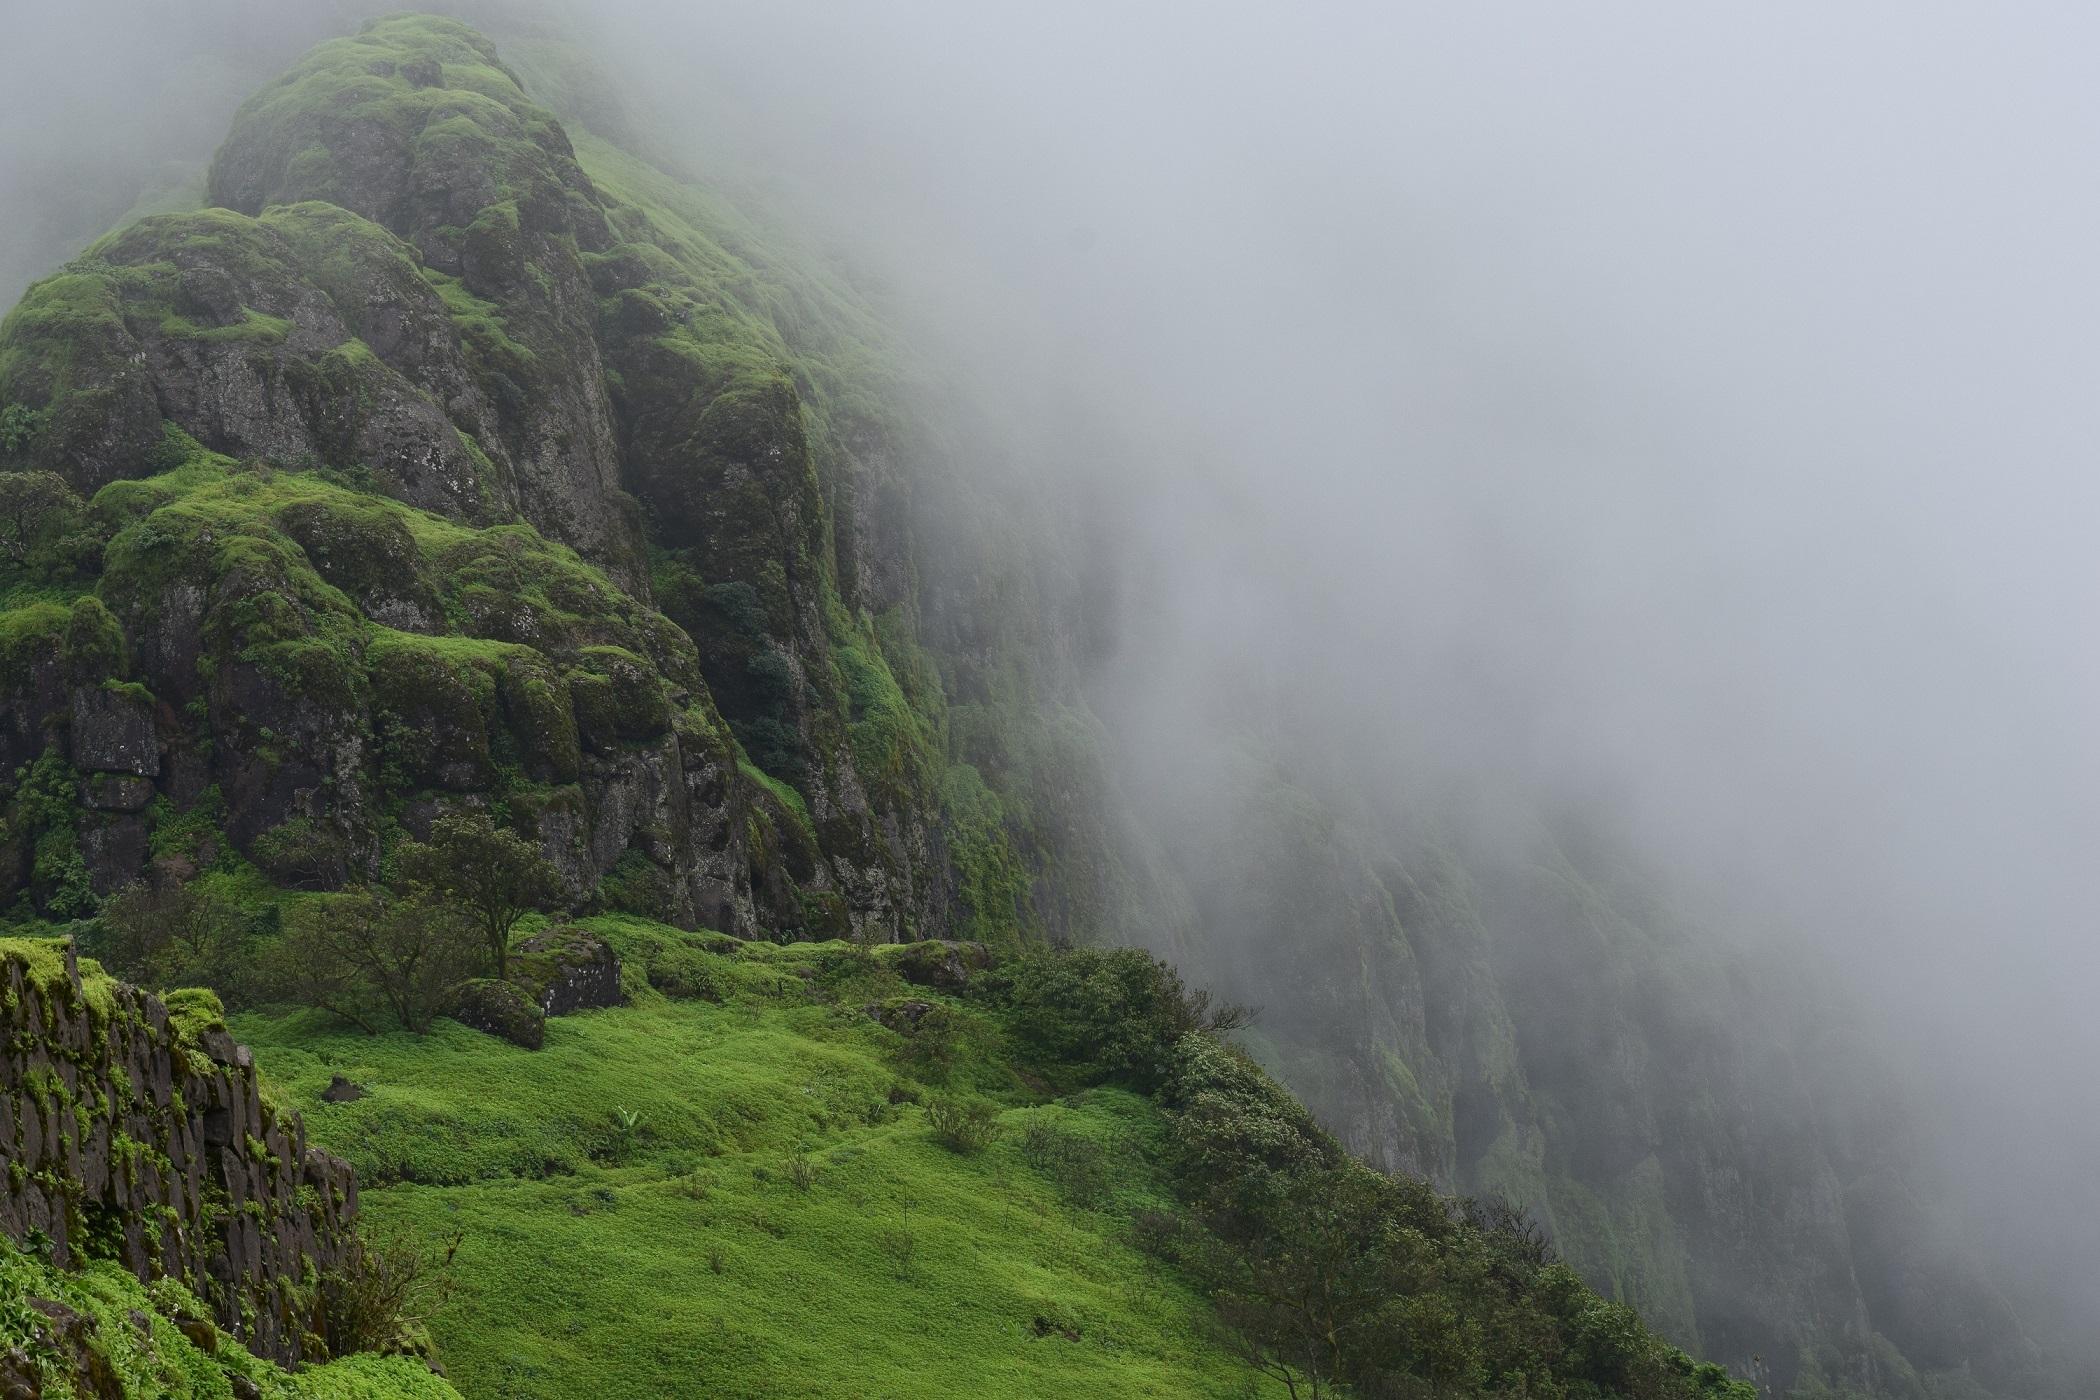 Rajgad Fort trekking photos mansoon DSLR 1 1 Rajgad Fort Pune - Information & Awesome Trekking experience